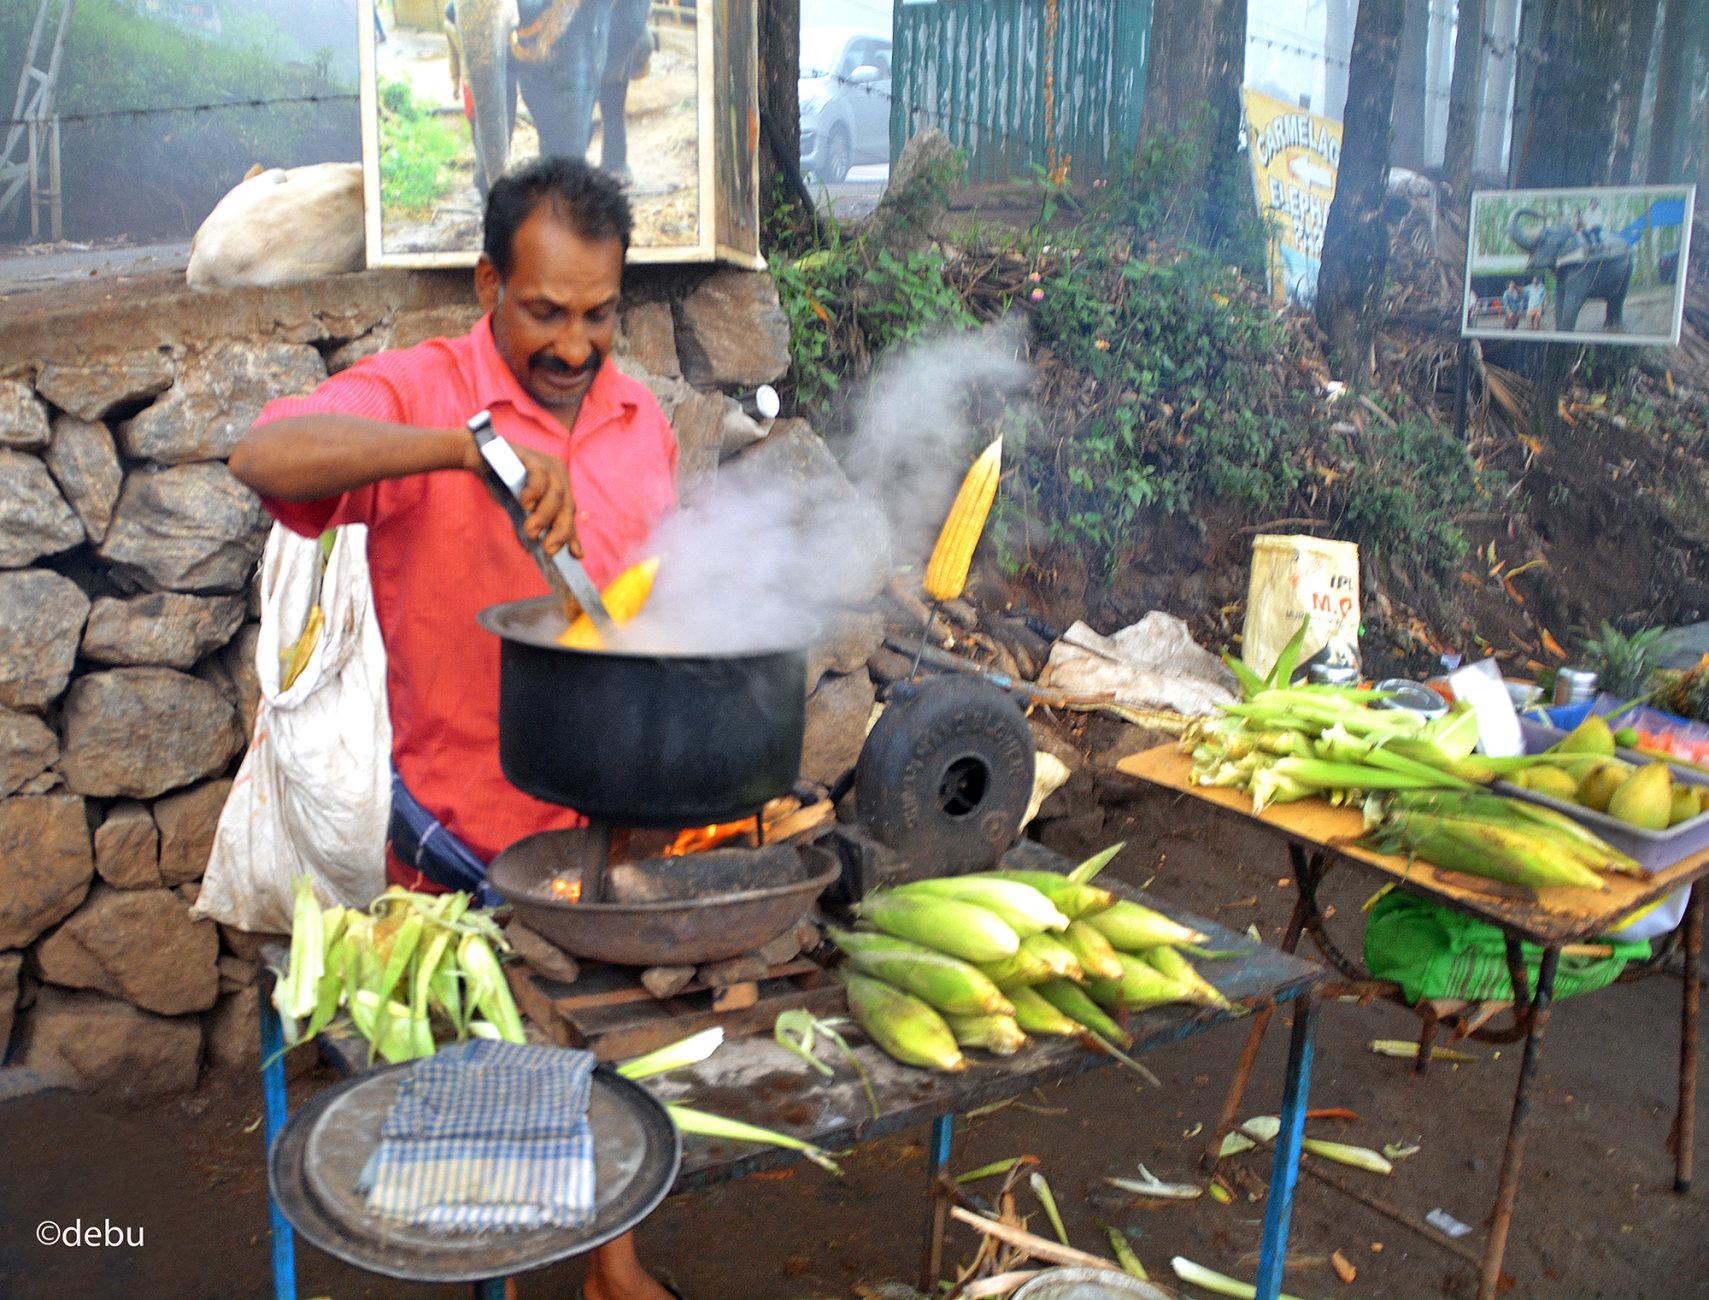 A poor street vendor in india selling corns